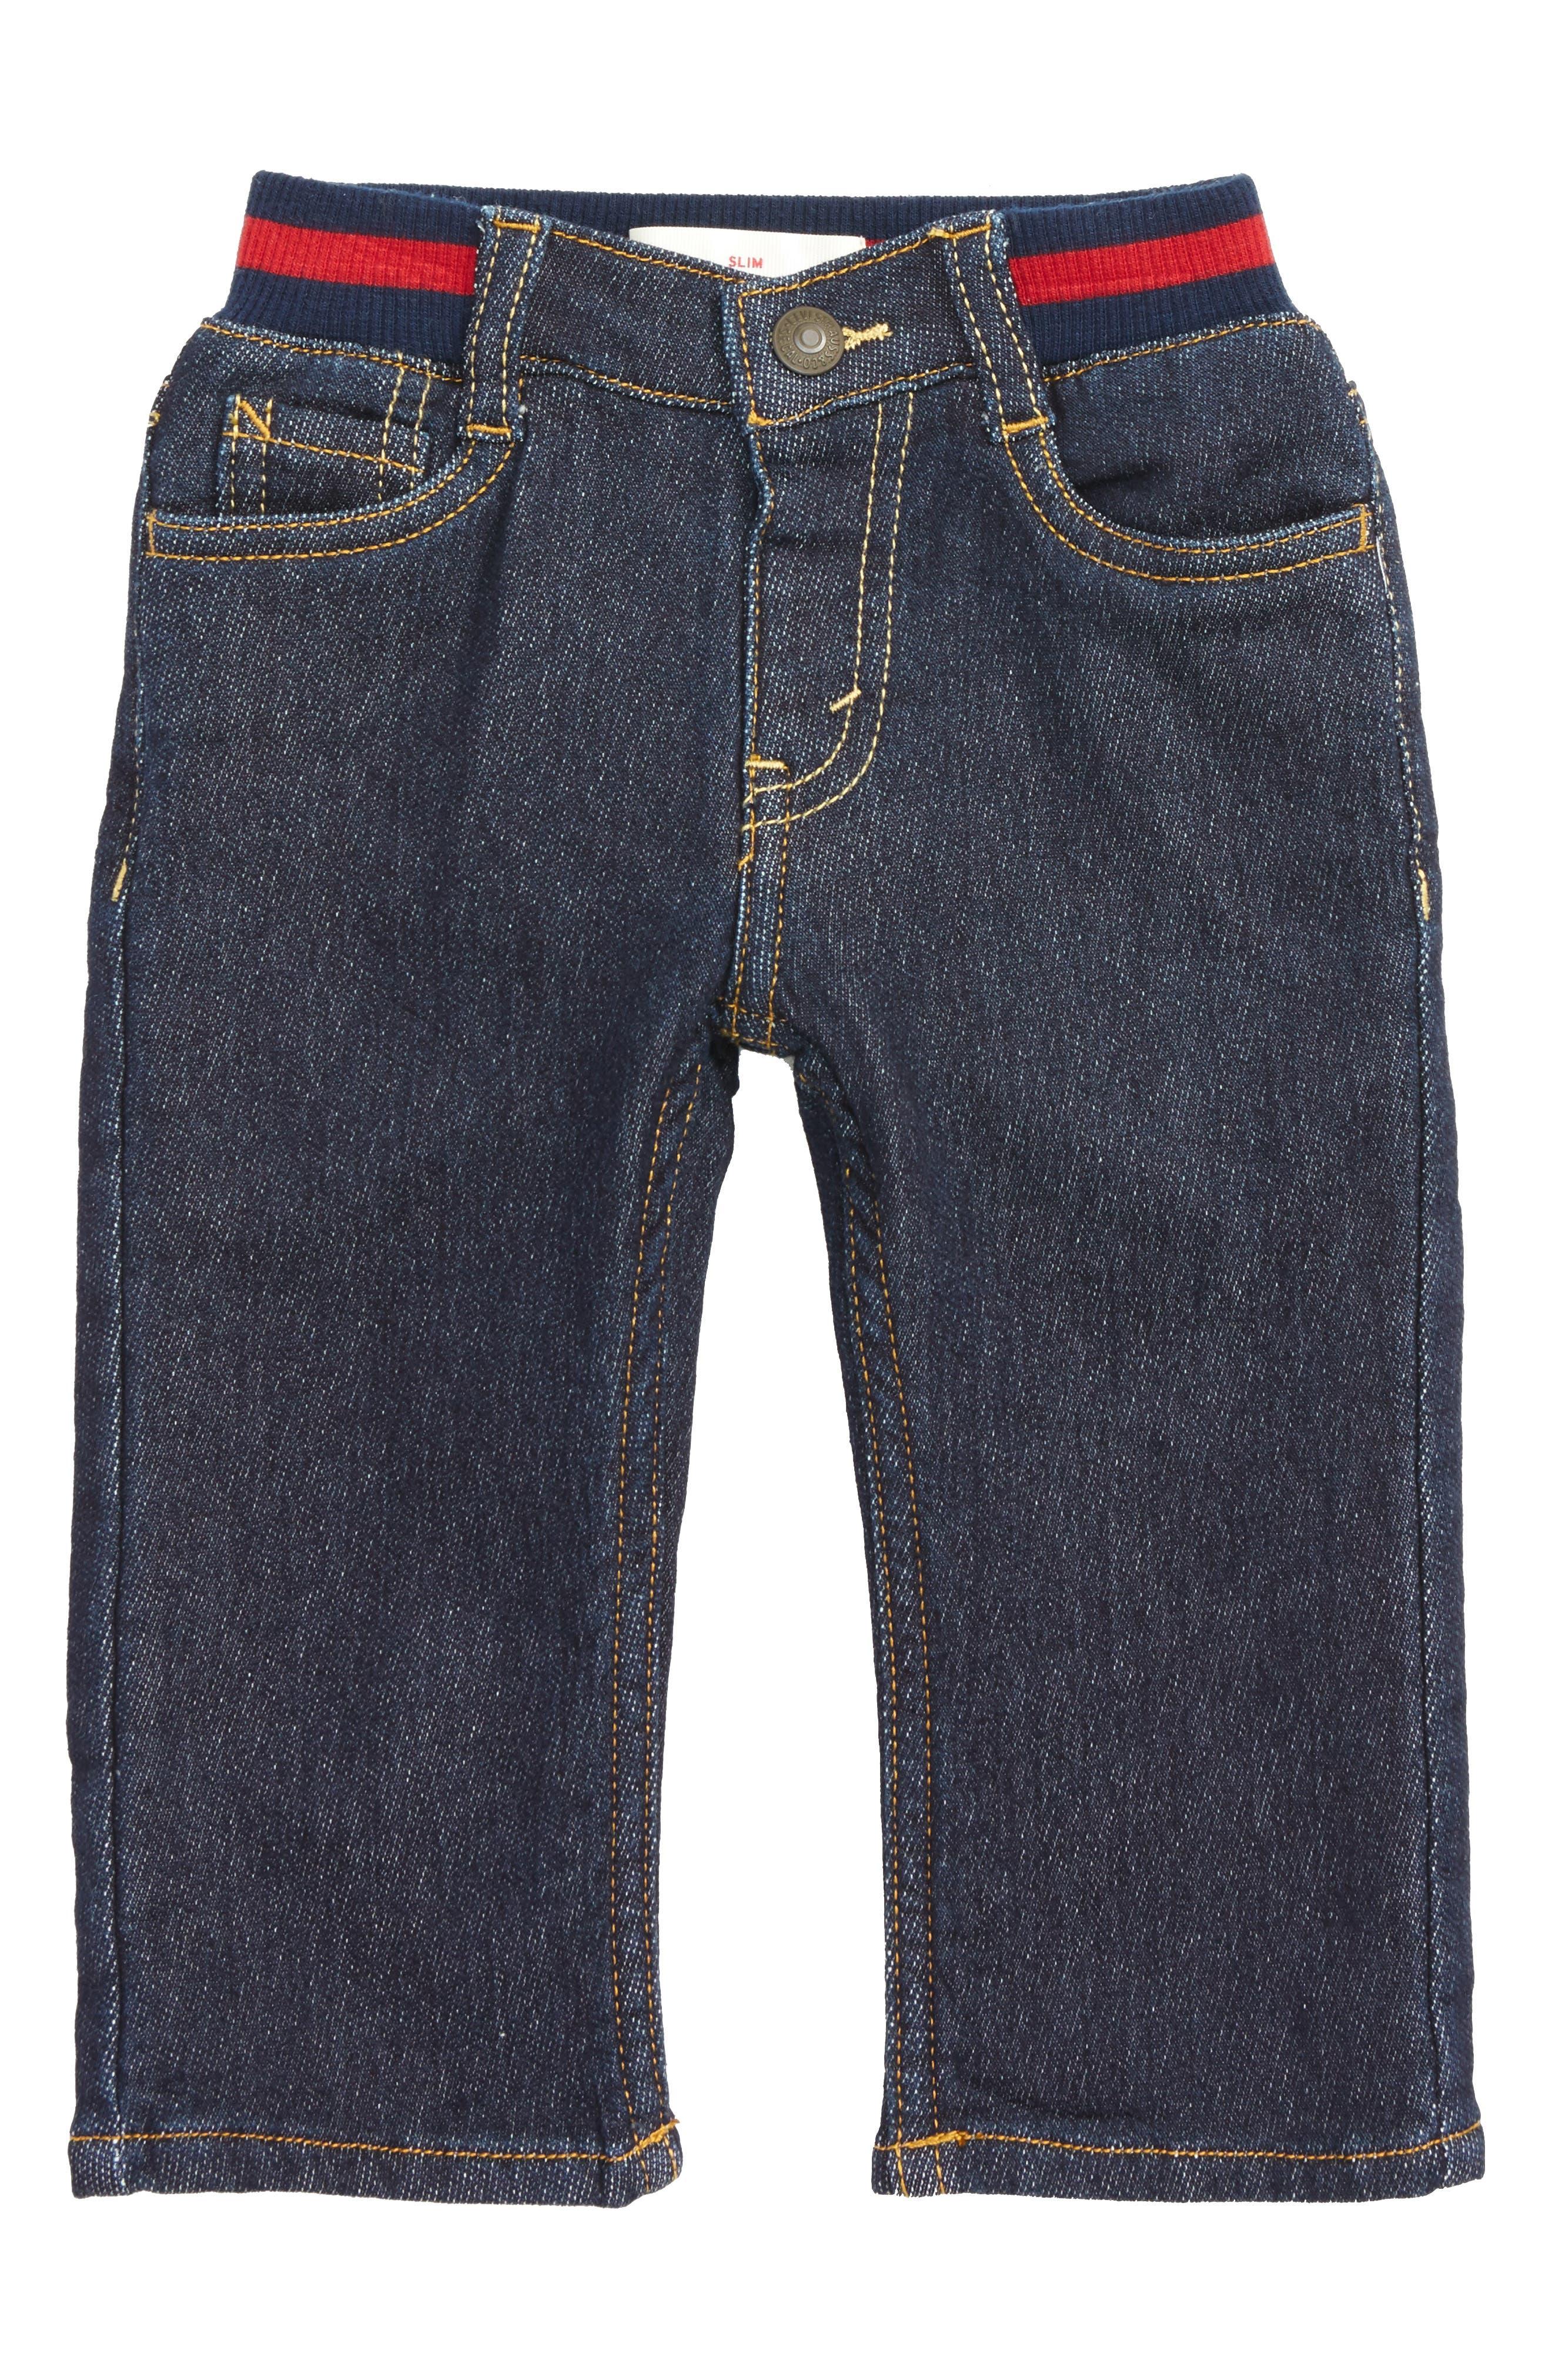 Main Image - Levi's® Bayview Jeans (Hermosa) (Baby Boys)